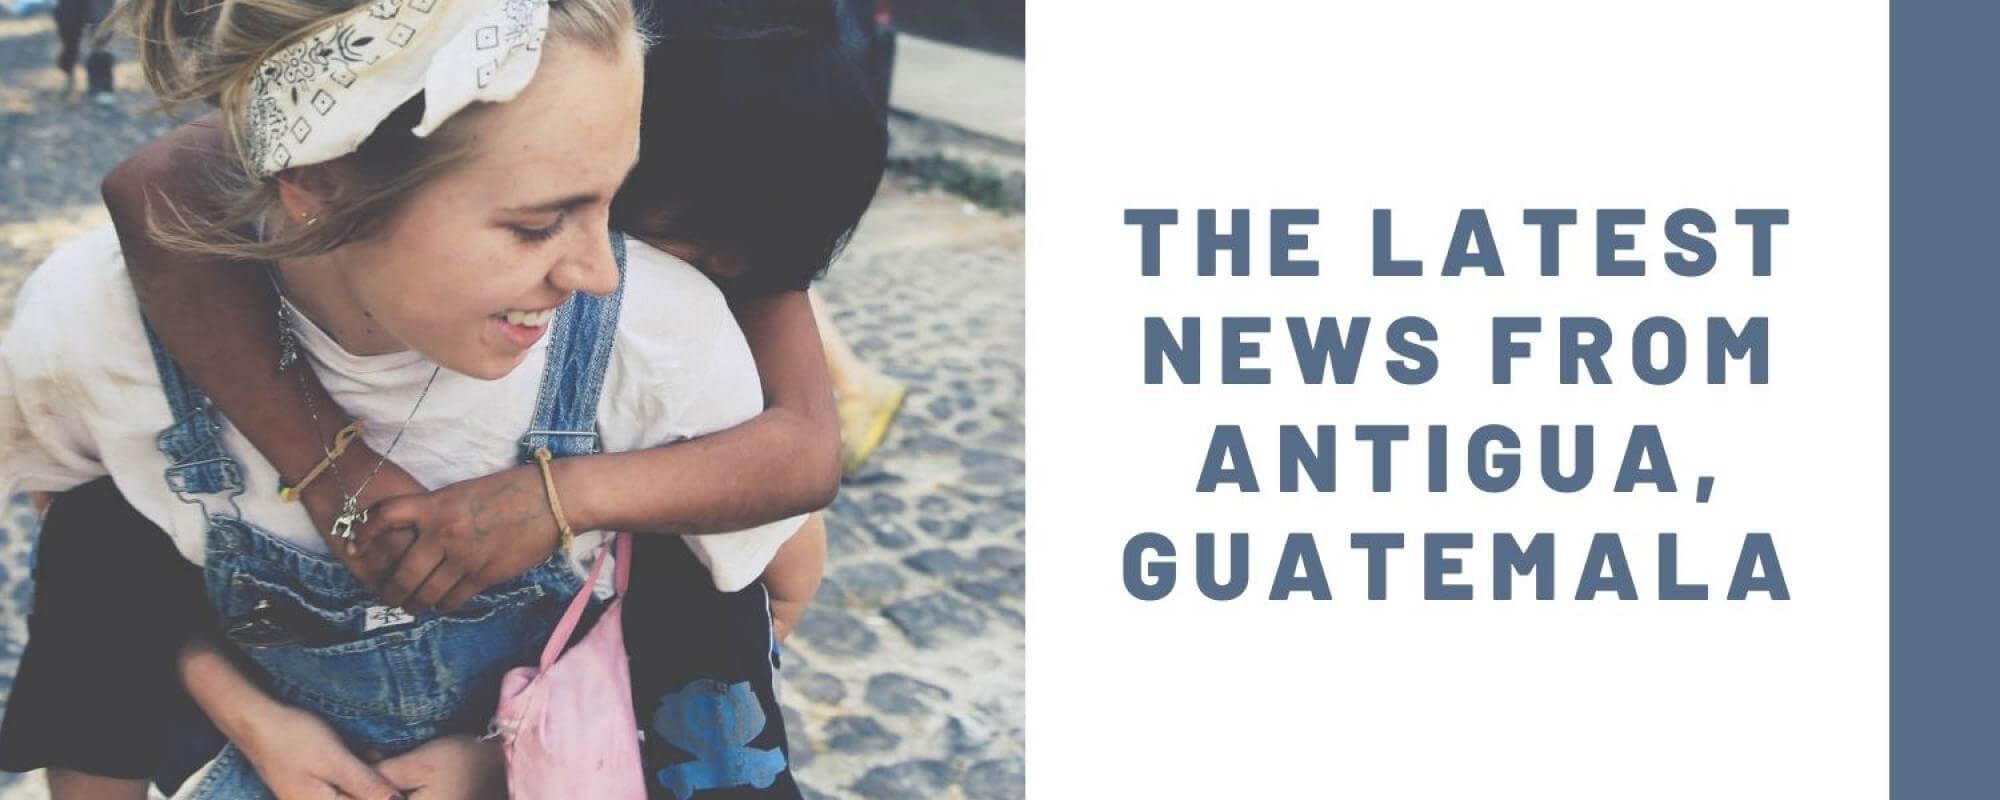 The Latest News From Antigua Guatemala